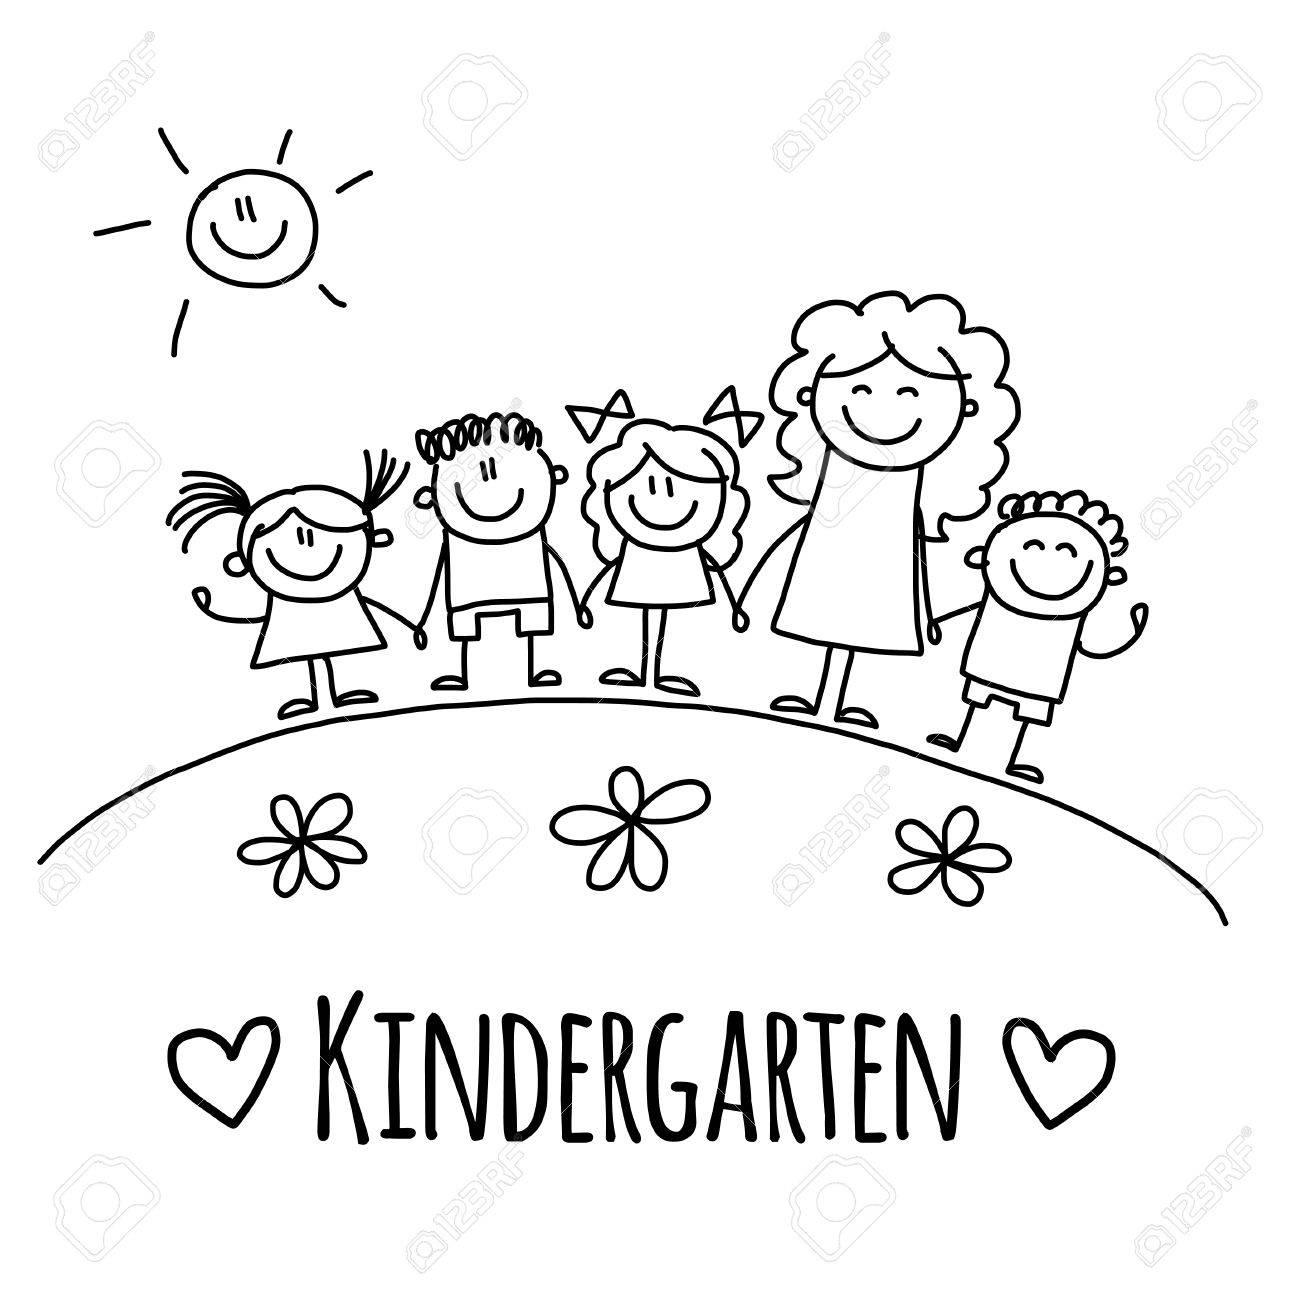 1300x1300 Kindergarten Teacher Stock Photos. Royalty Free Business Images